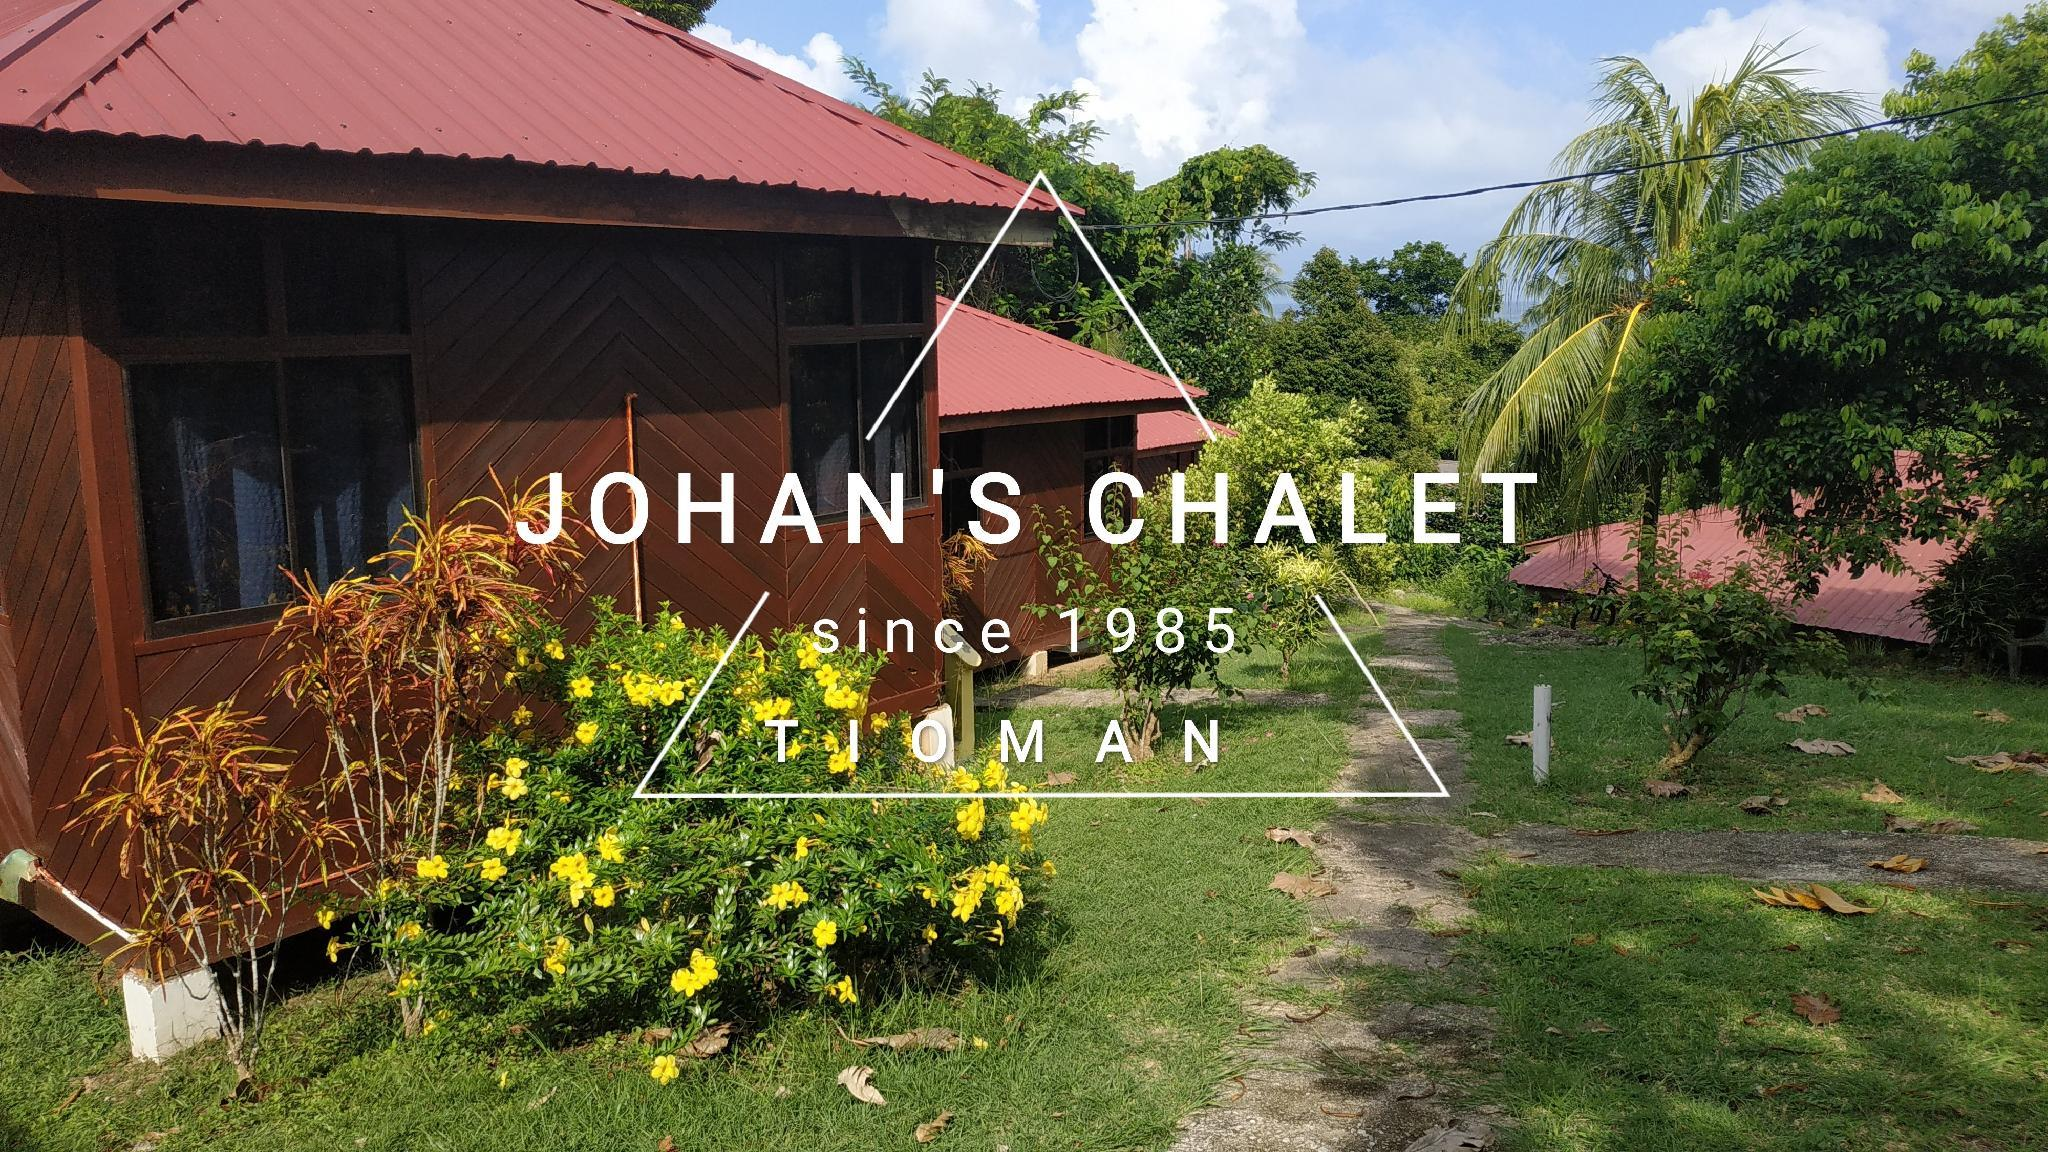 Johan's chalet and Restaurant